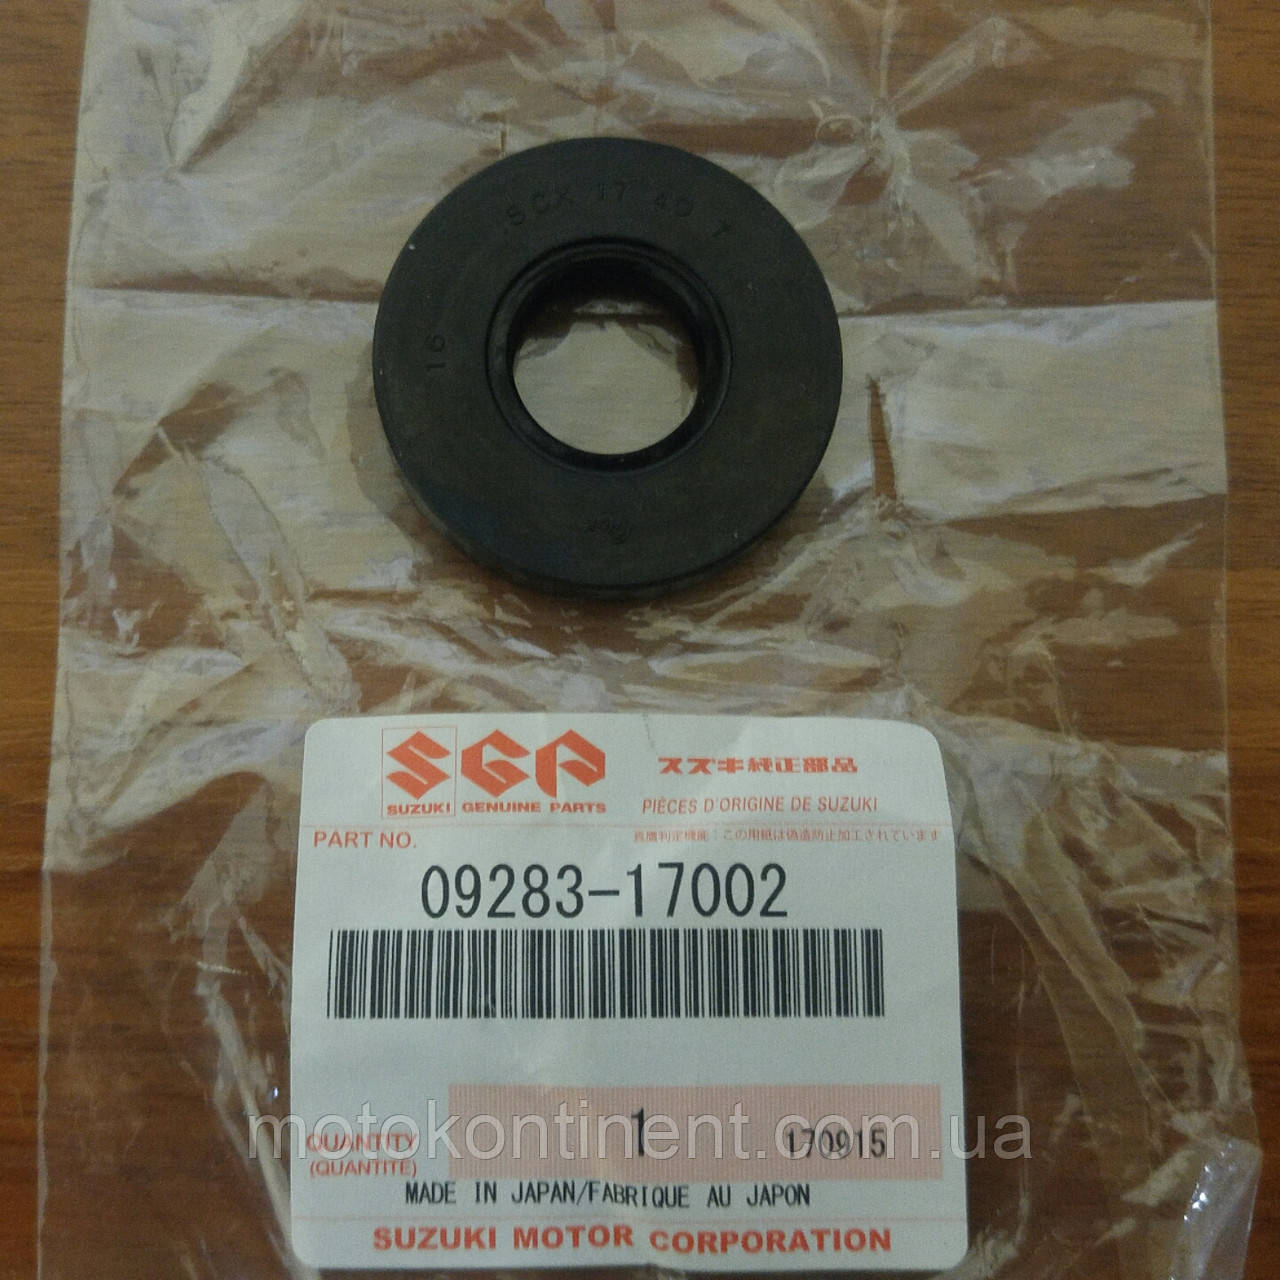 09283-17002 Сальник коленвала верхний/нижний Suzuki DT2/DT4/DT5/DT6/DT8/DT9 17x40x7